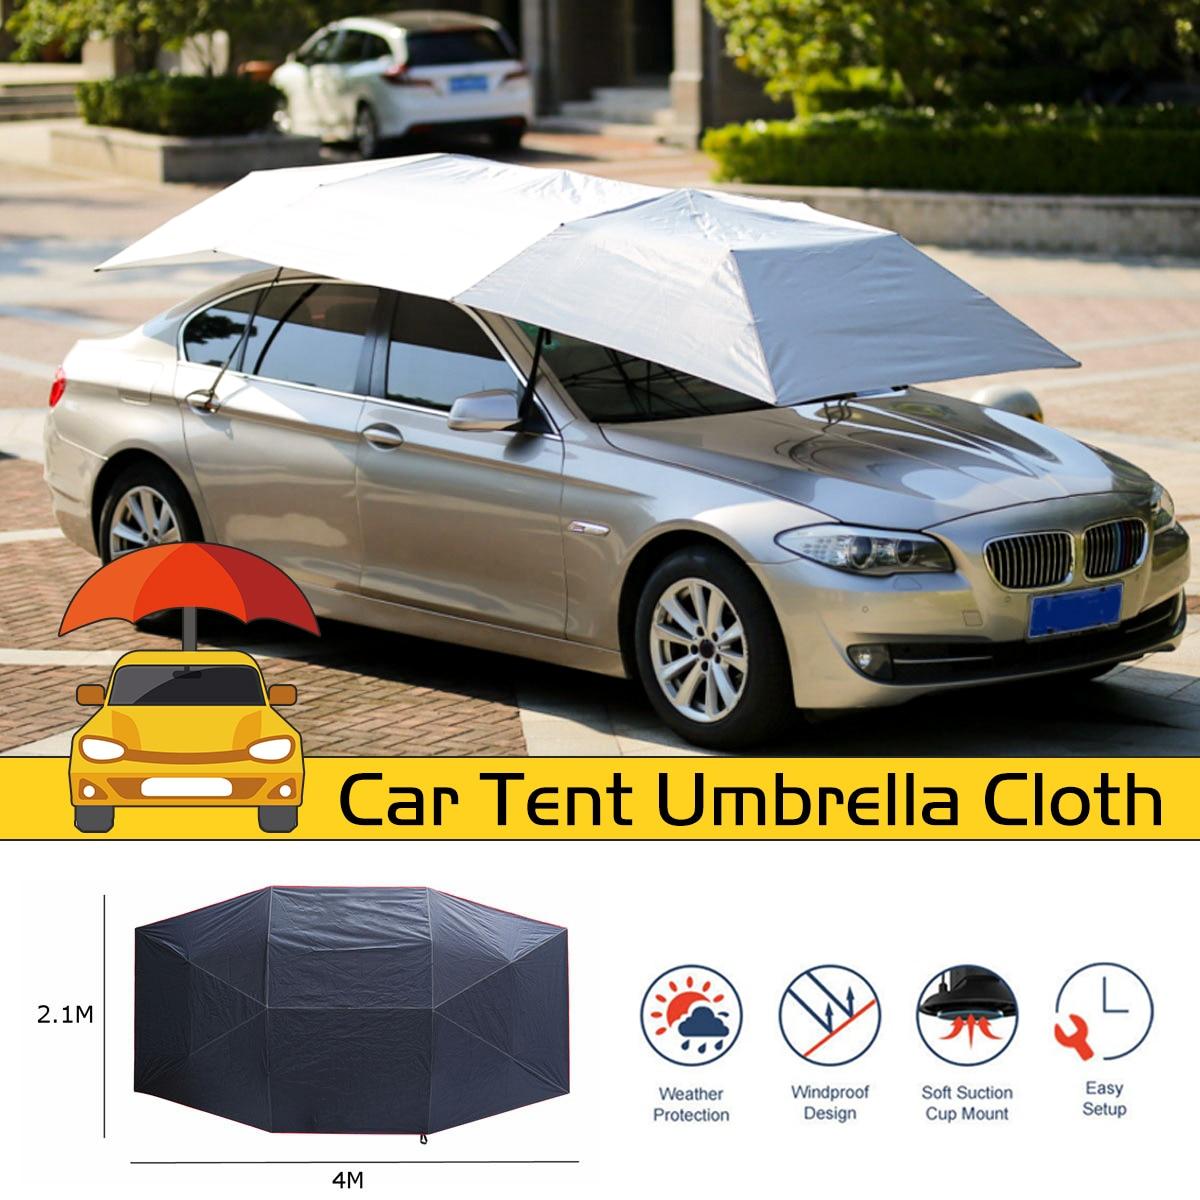 Anti UV impermeable, automática, completa, para exteriores, coche, carpa, sombrilla, cubierta de techo, sombrilla de coche, sombrilla de tela reemplazable